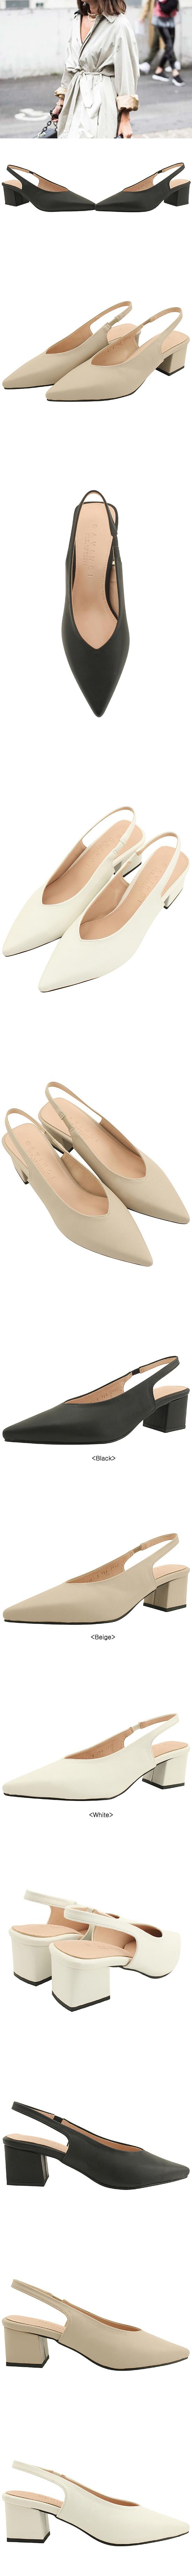 Stiletto heel slingback middle heel black